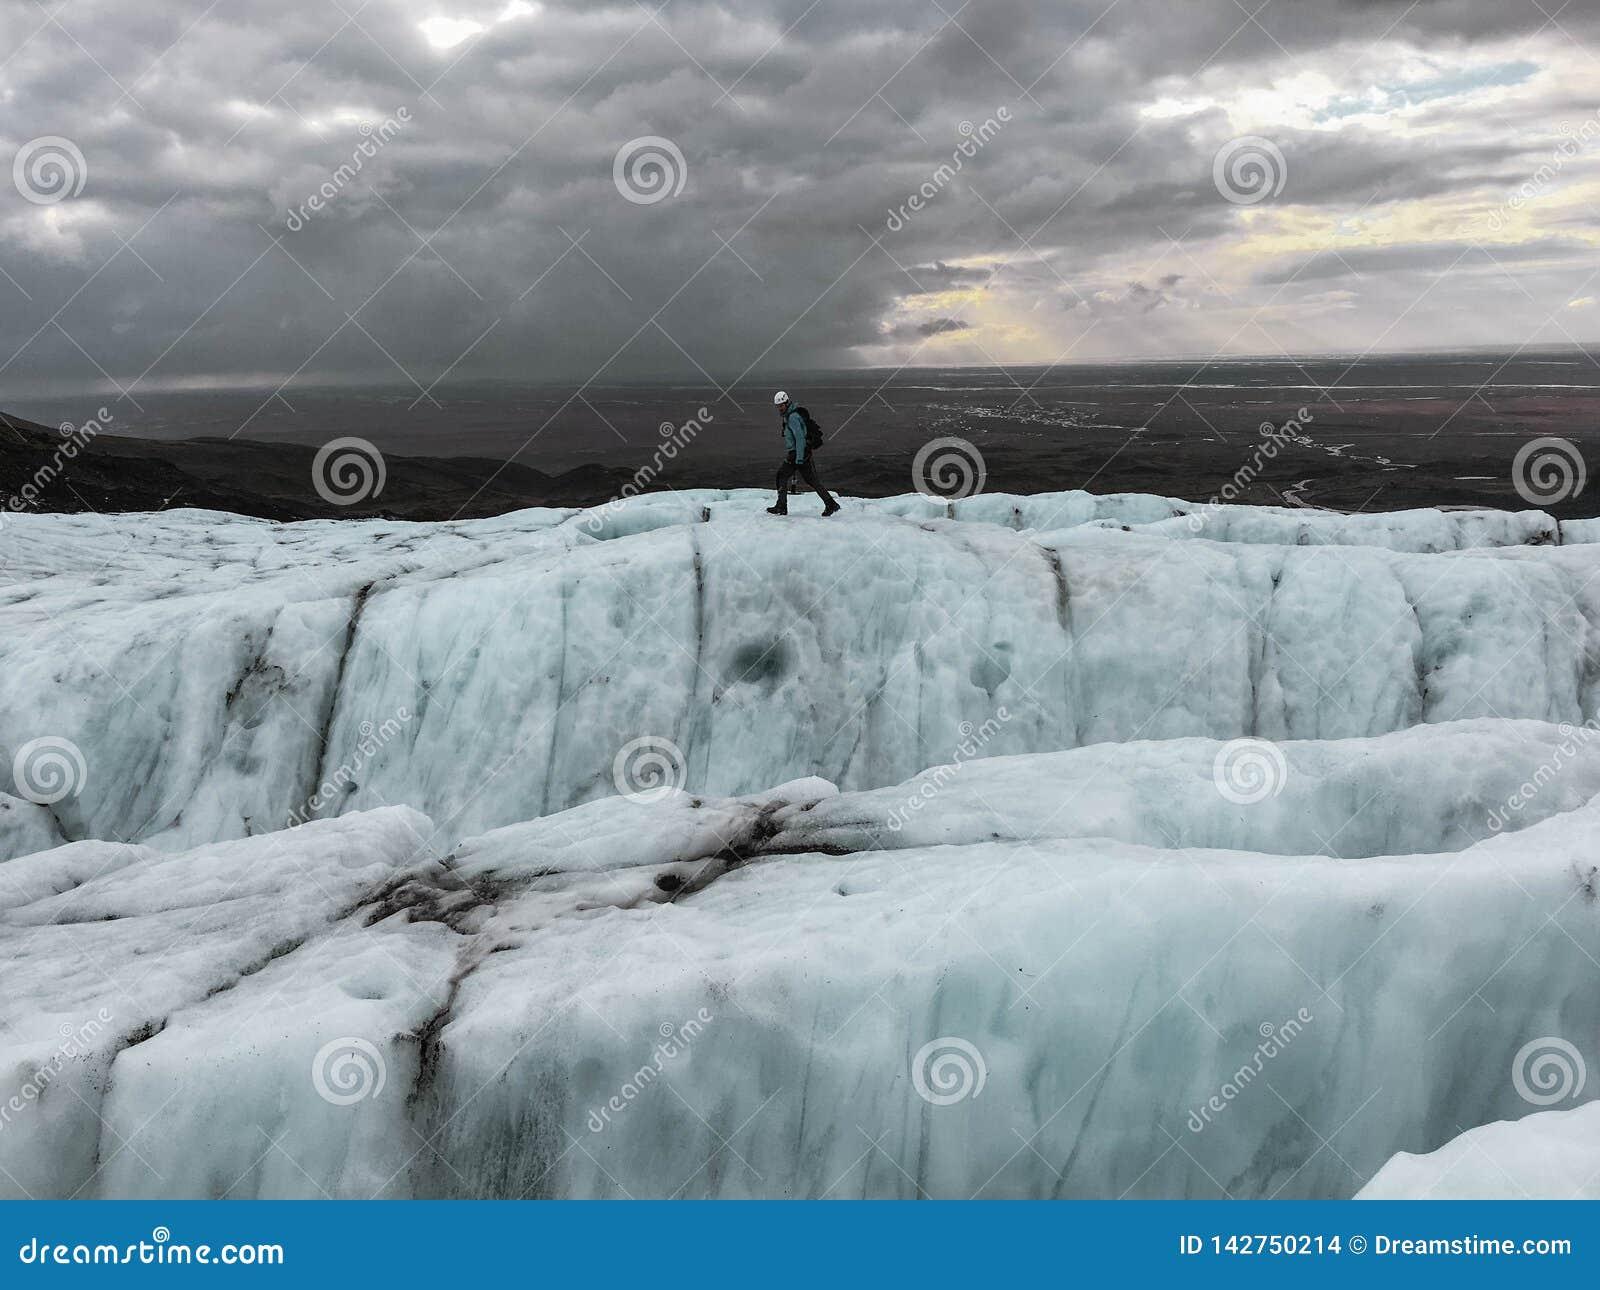 A climber walking across icelandic glaciers